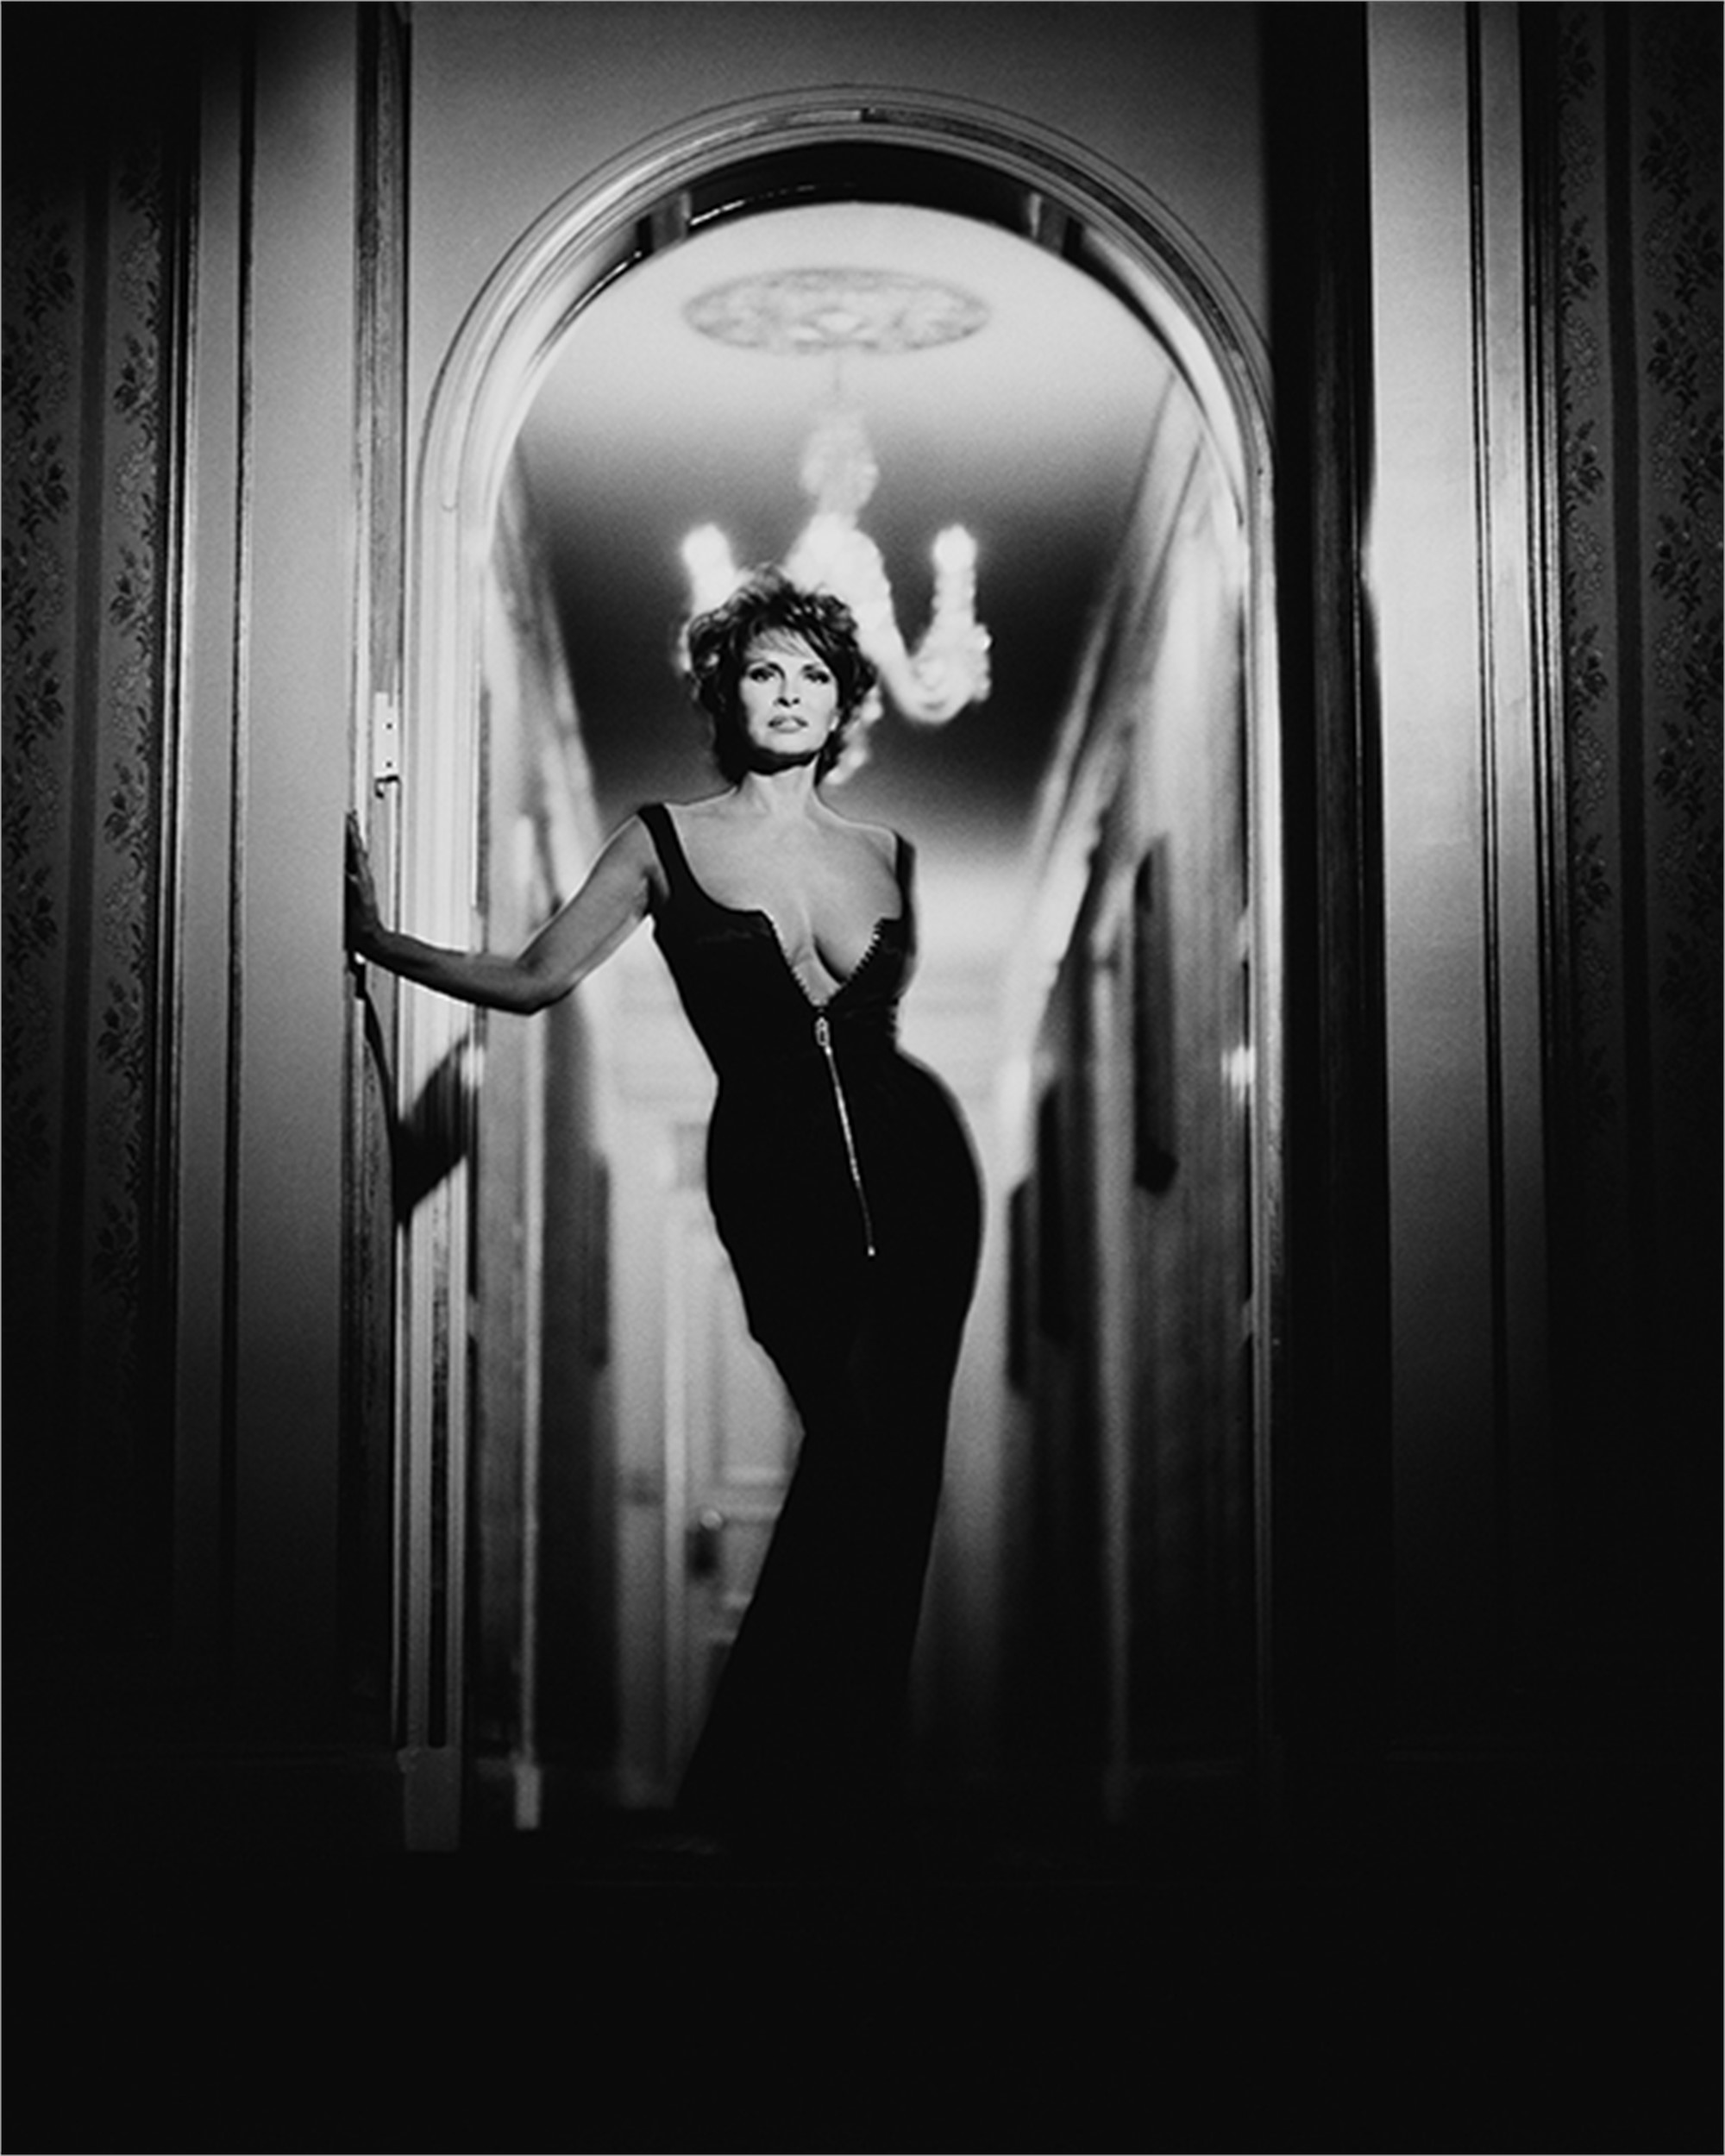 96017 Raquel Welch Doorway BW by Timothy White